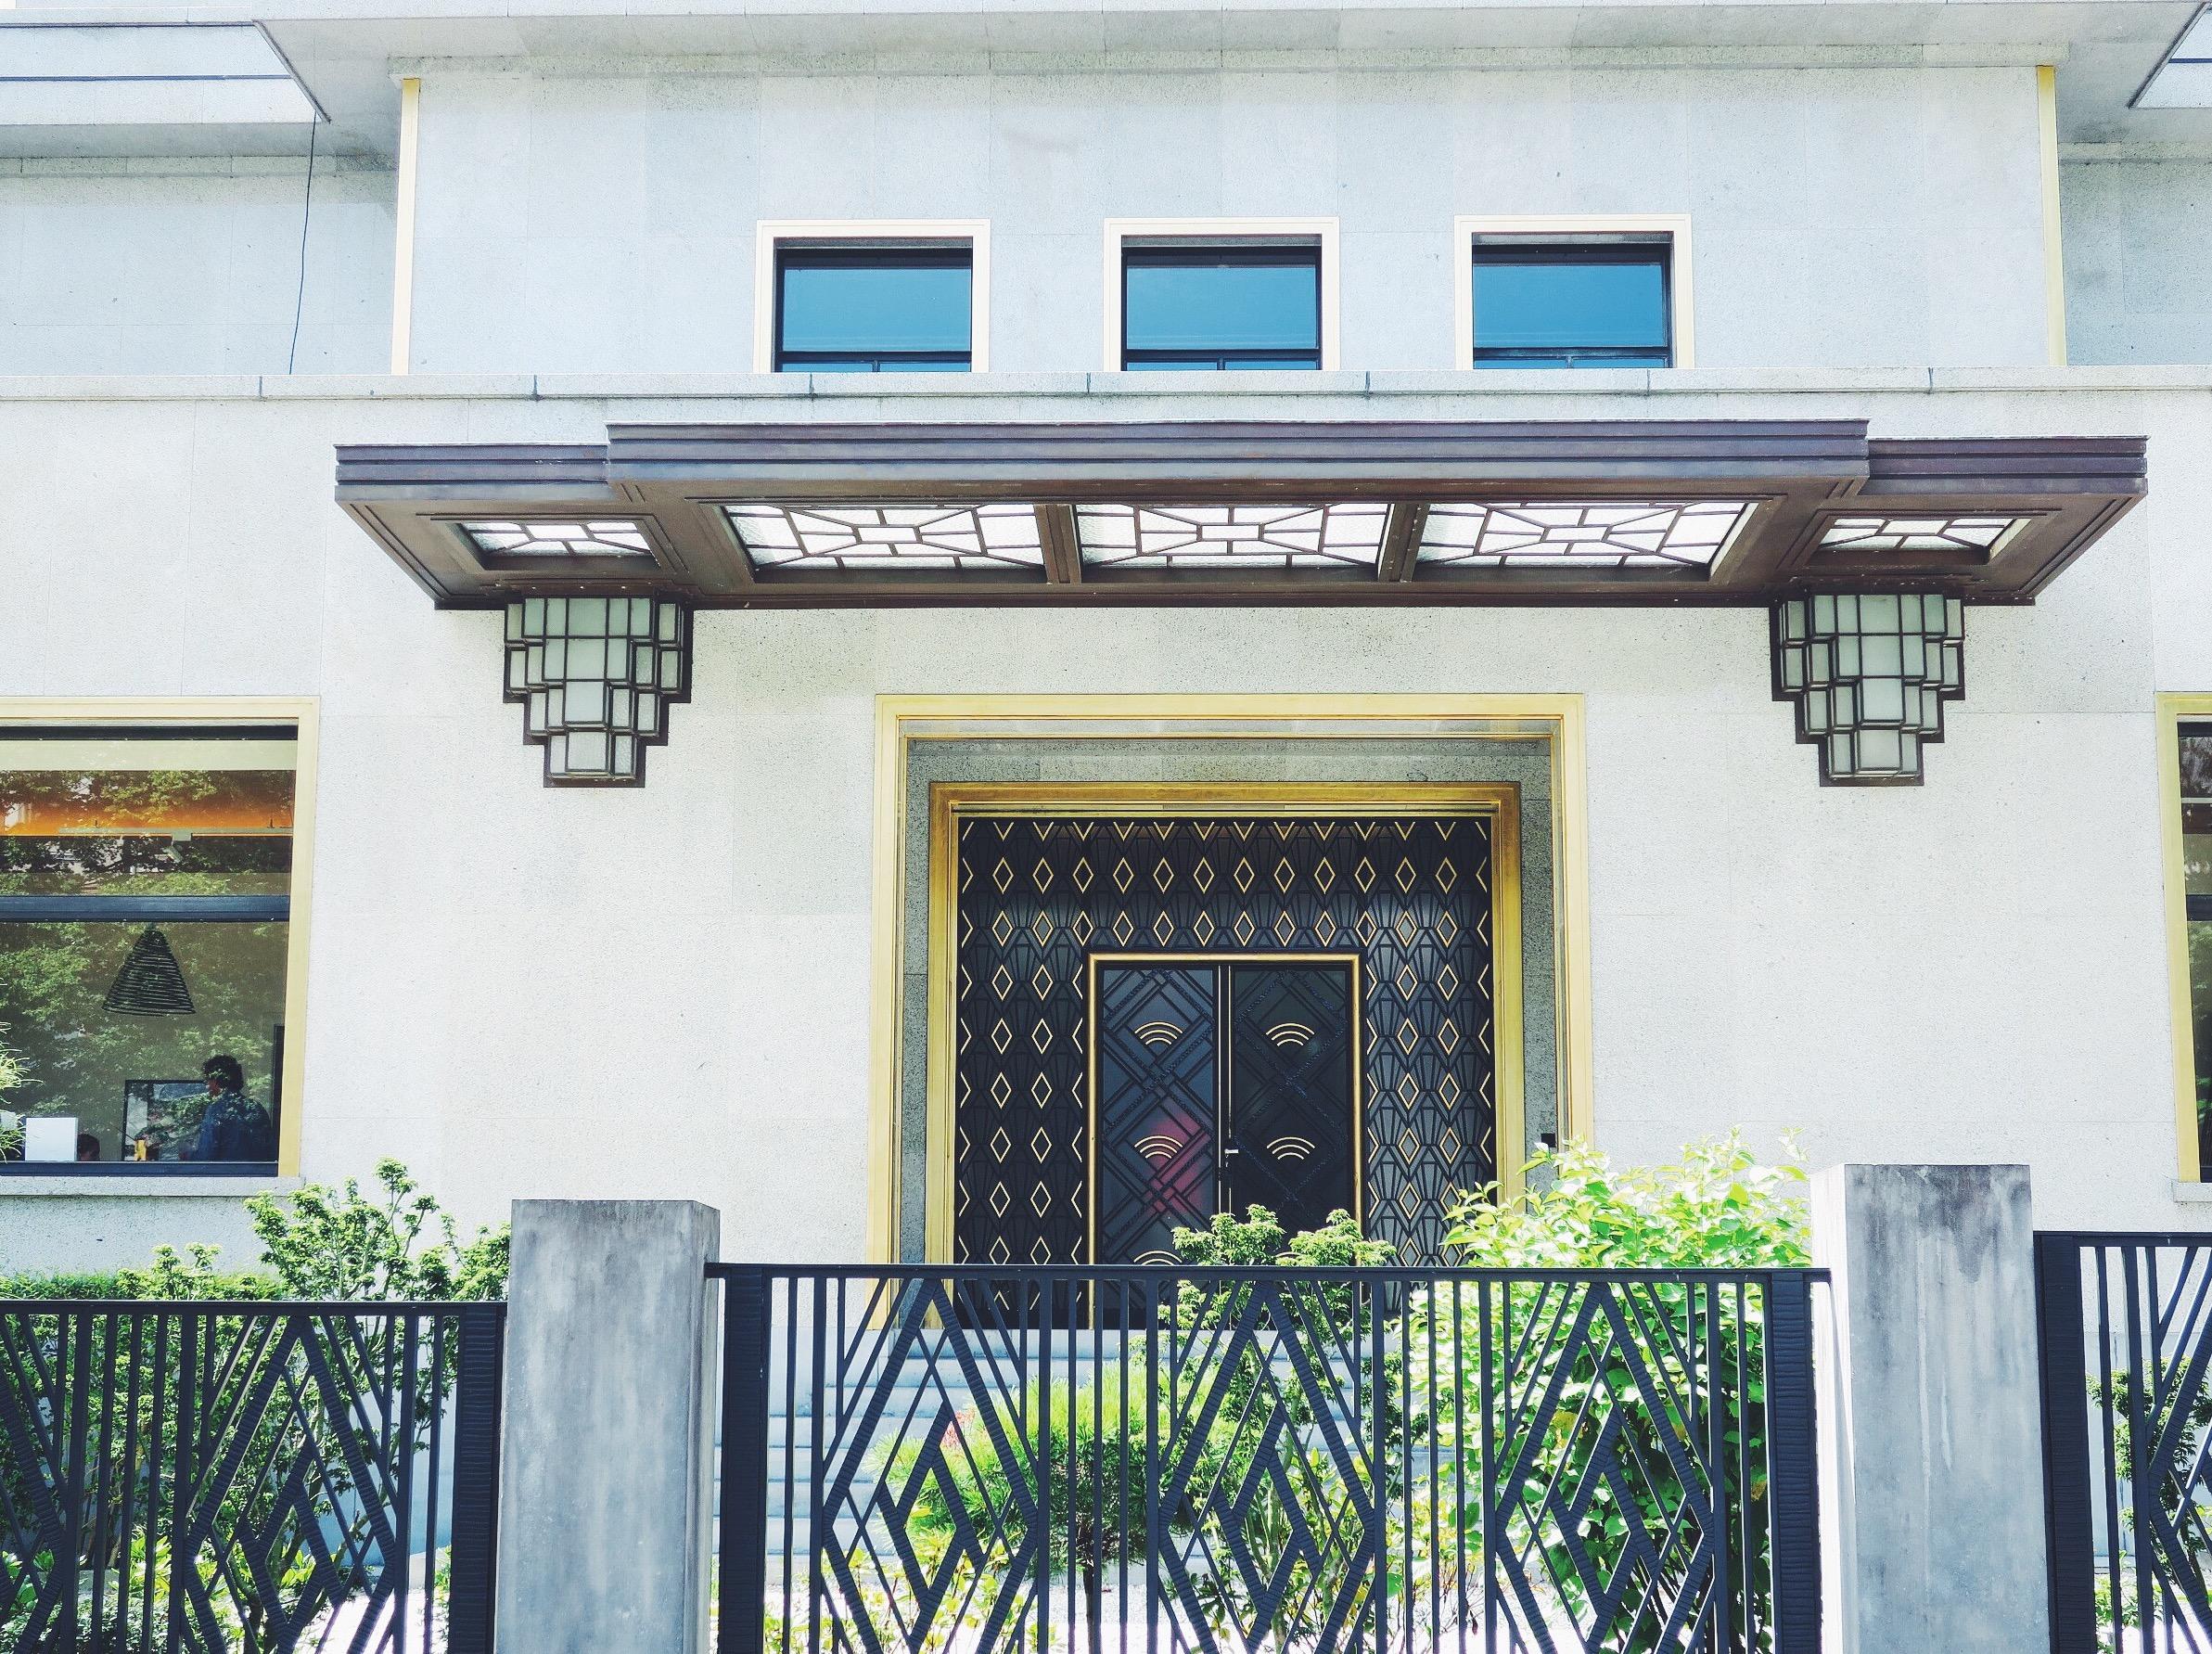 Villa Empain, Avenue Franklin Roosevelt 67, Brussels